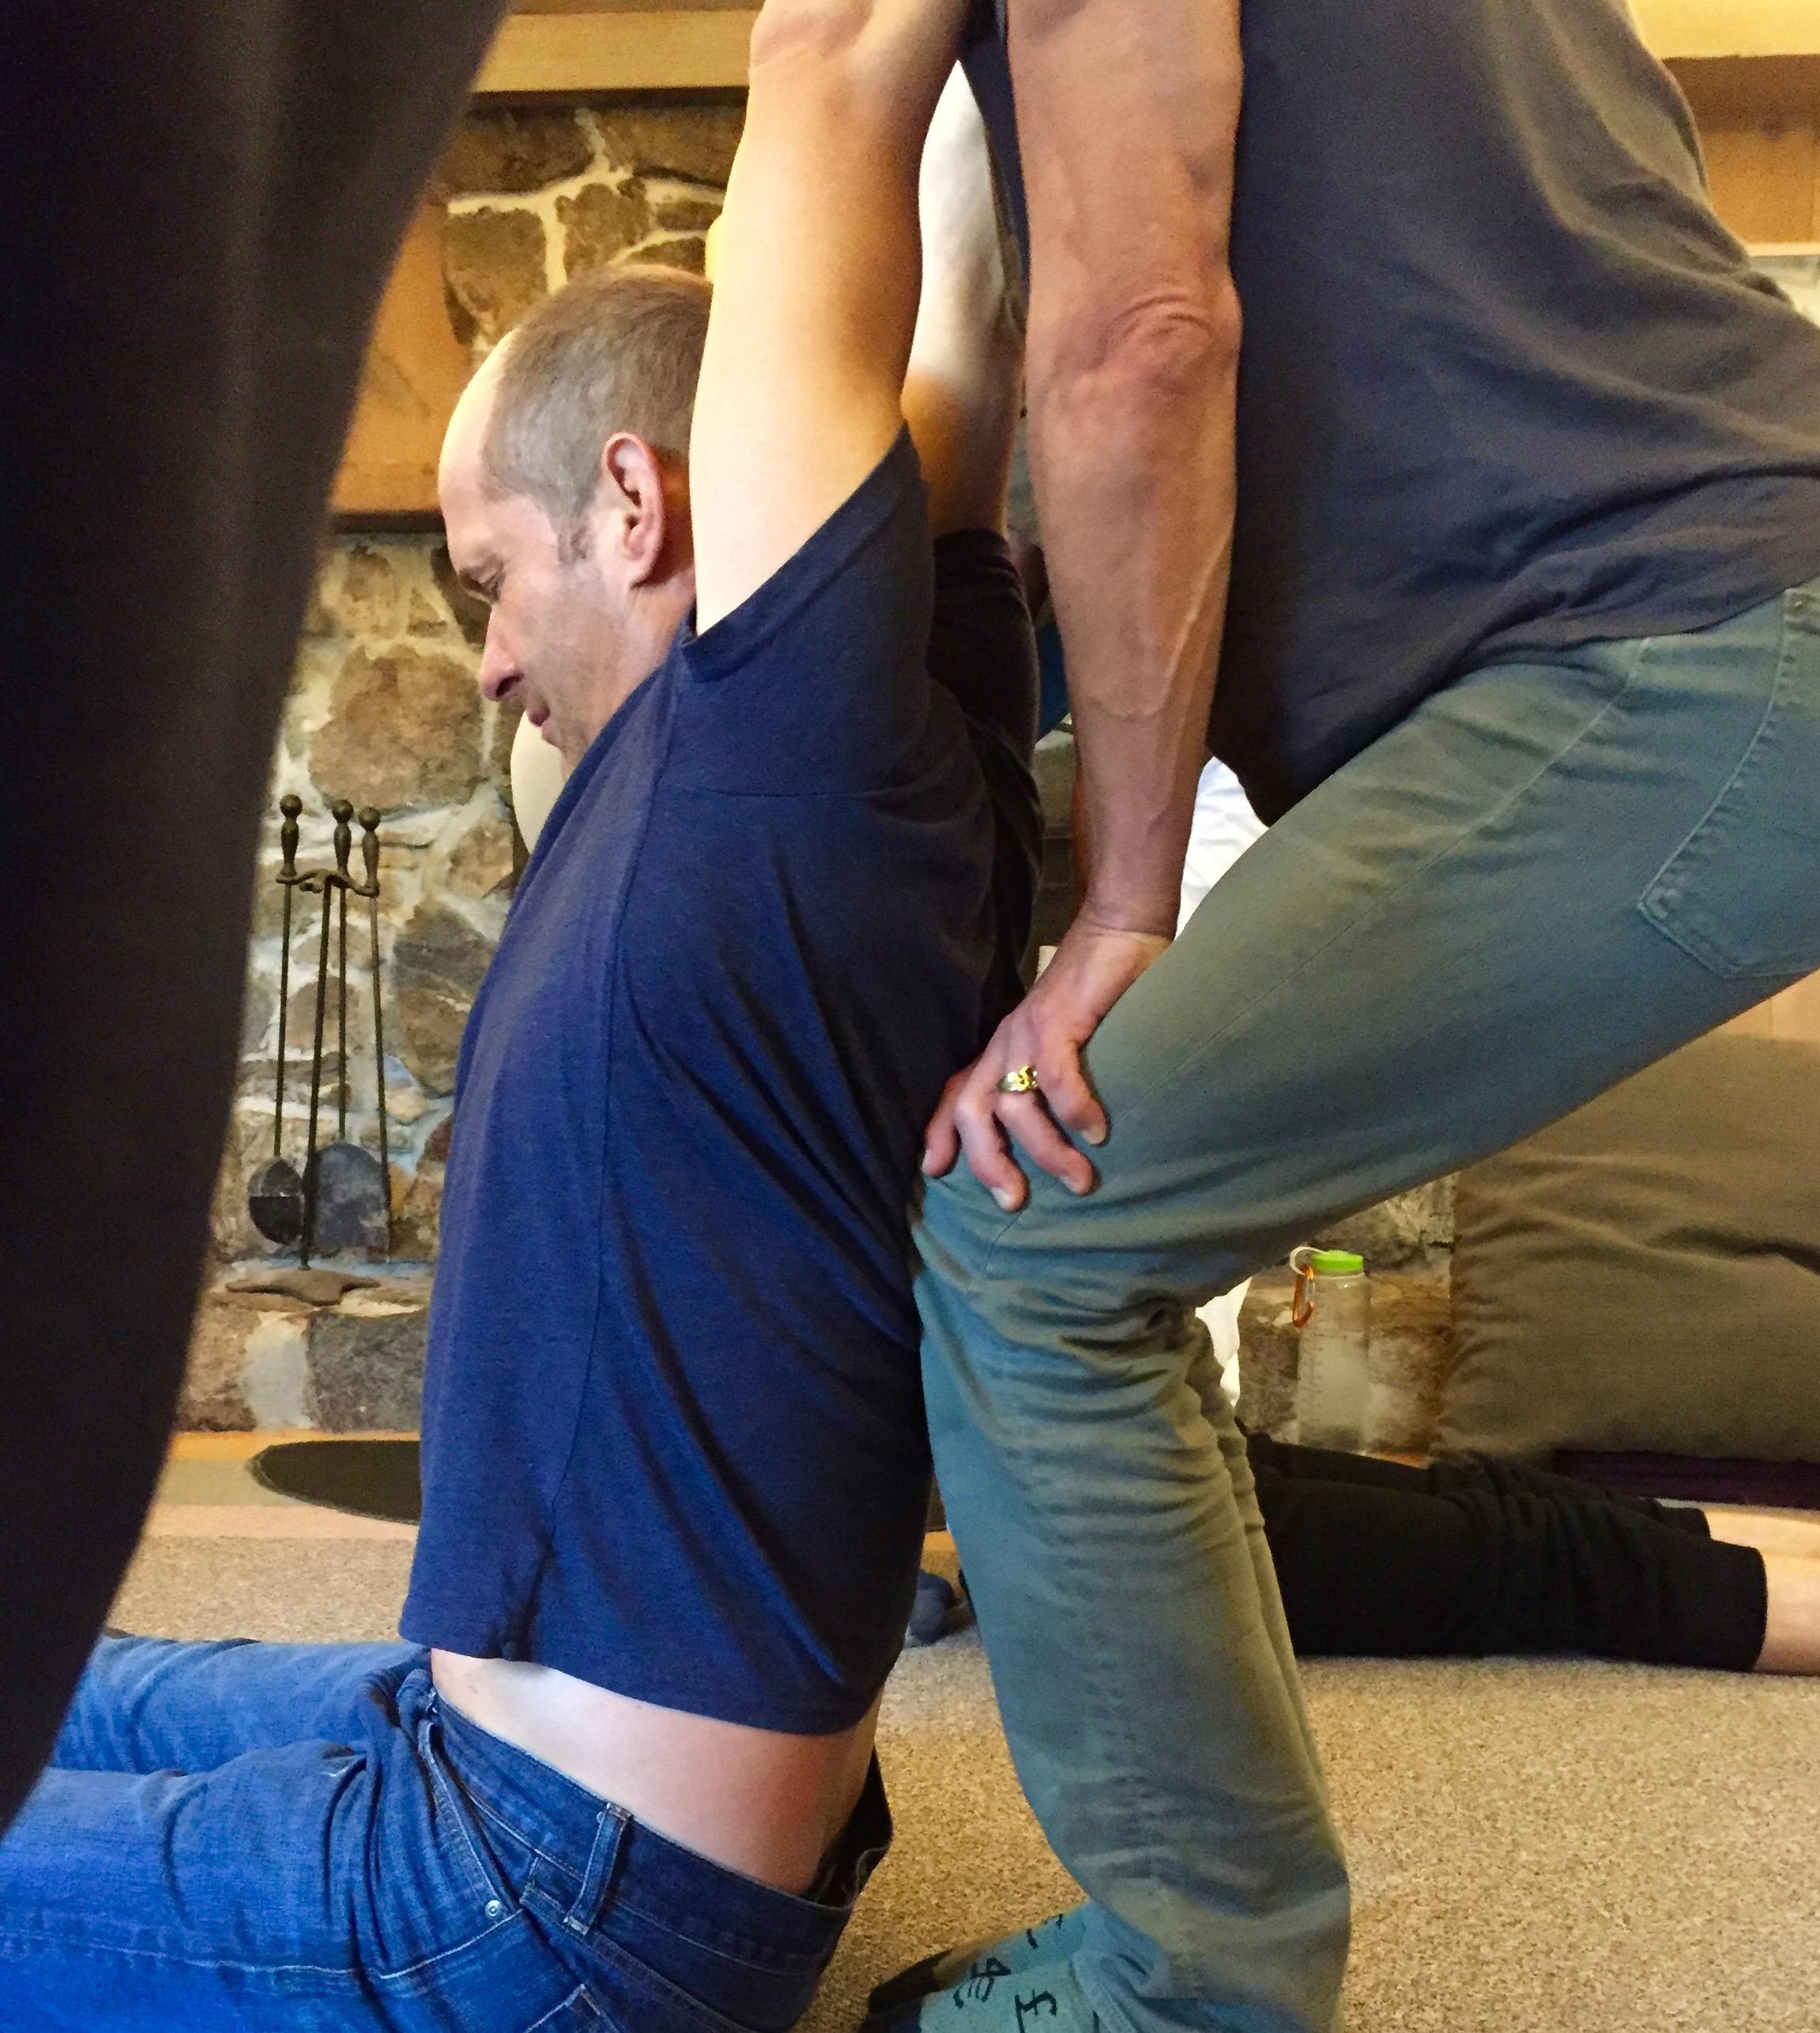 Gay-Mens-Lifequest-Intensive-Esalen-Institue-Big-Sur-12-Steven-Hartman.jpg